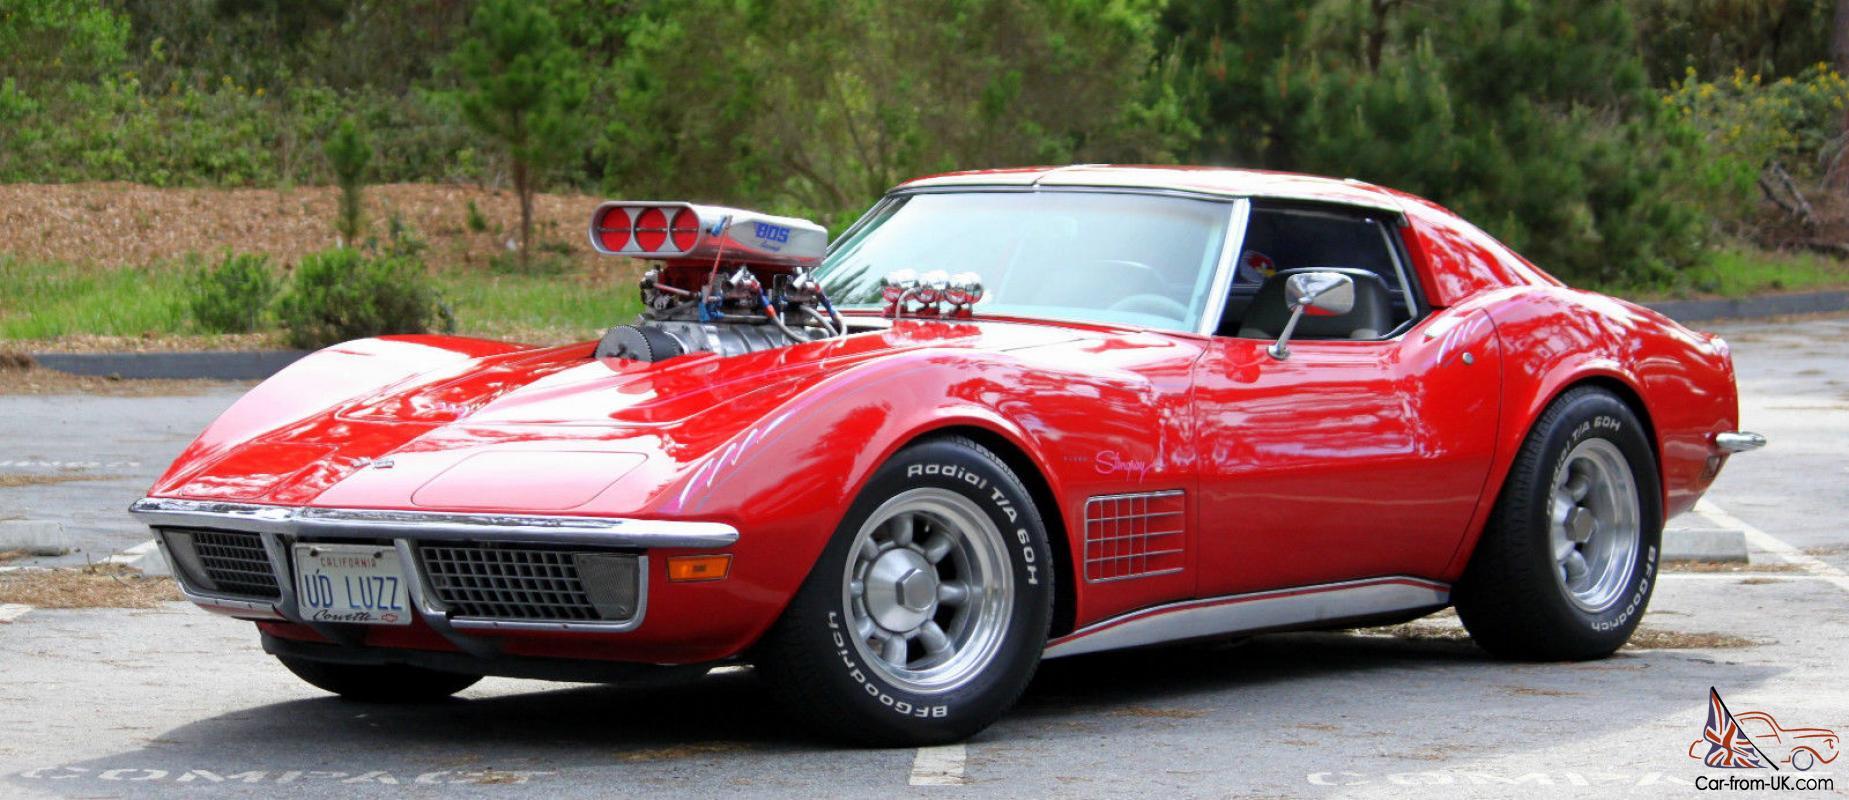 Corvette 1970 chevrolet corvette stingray : Corvette Stingray